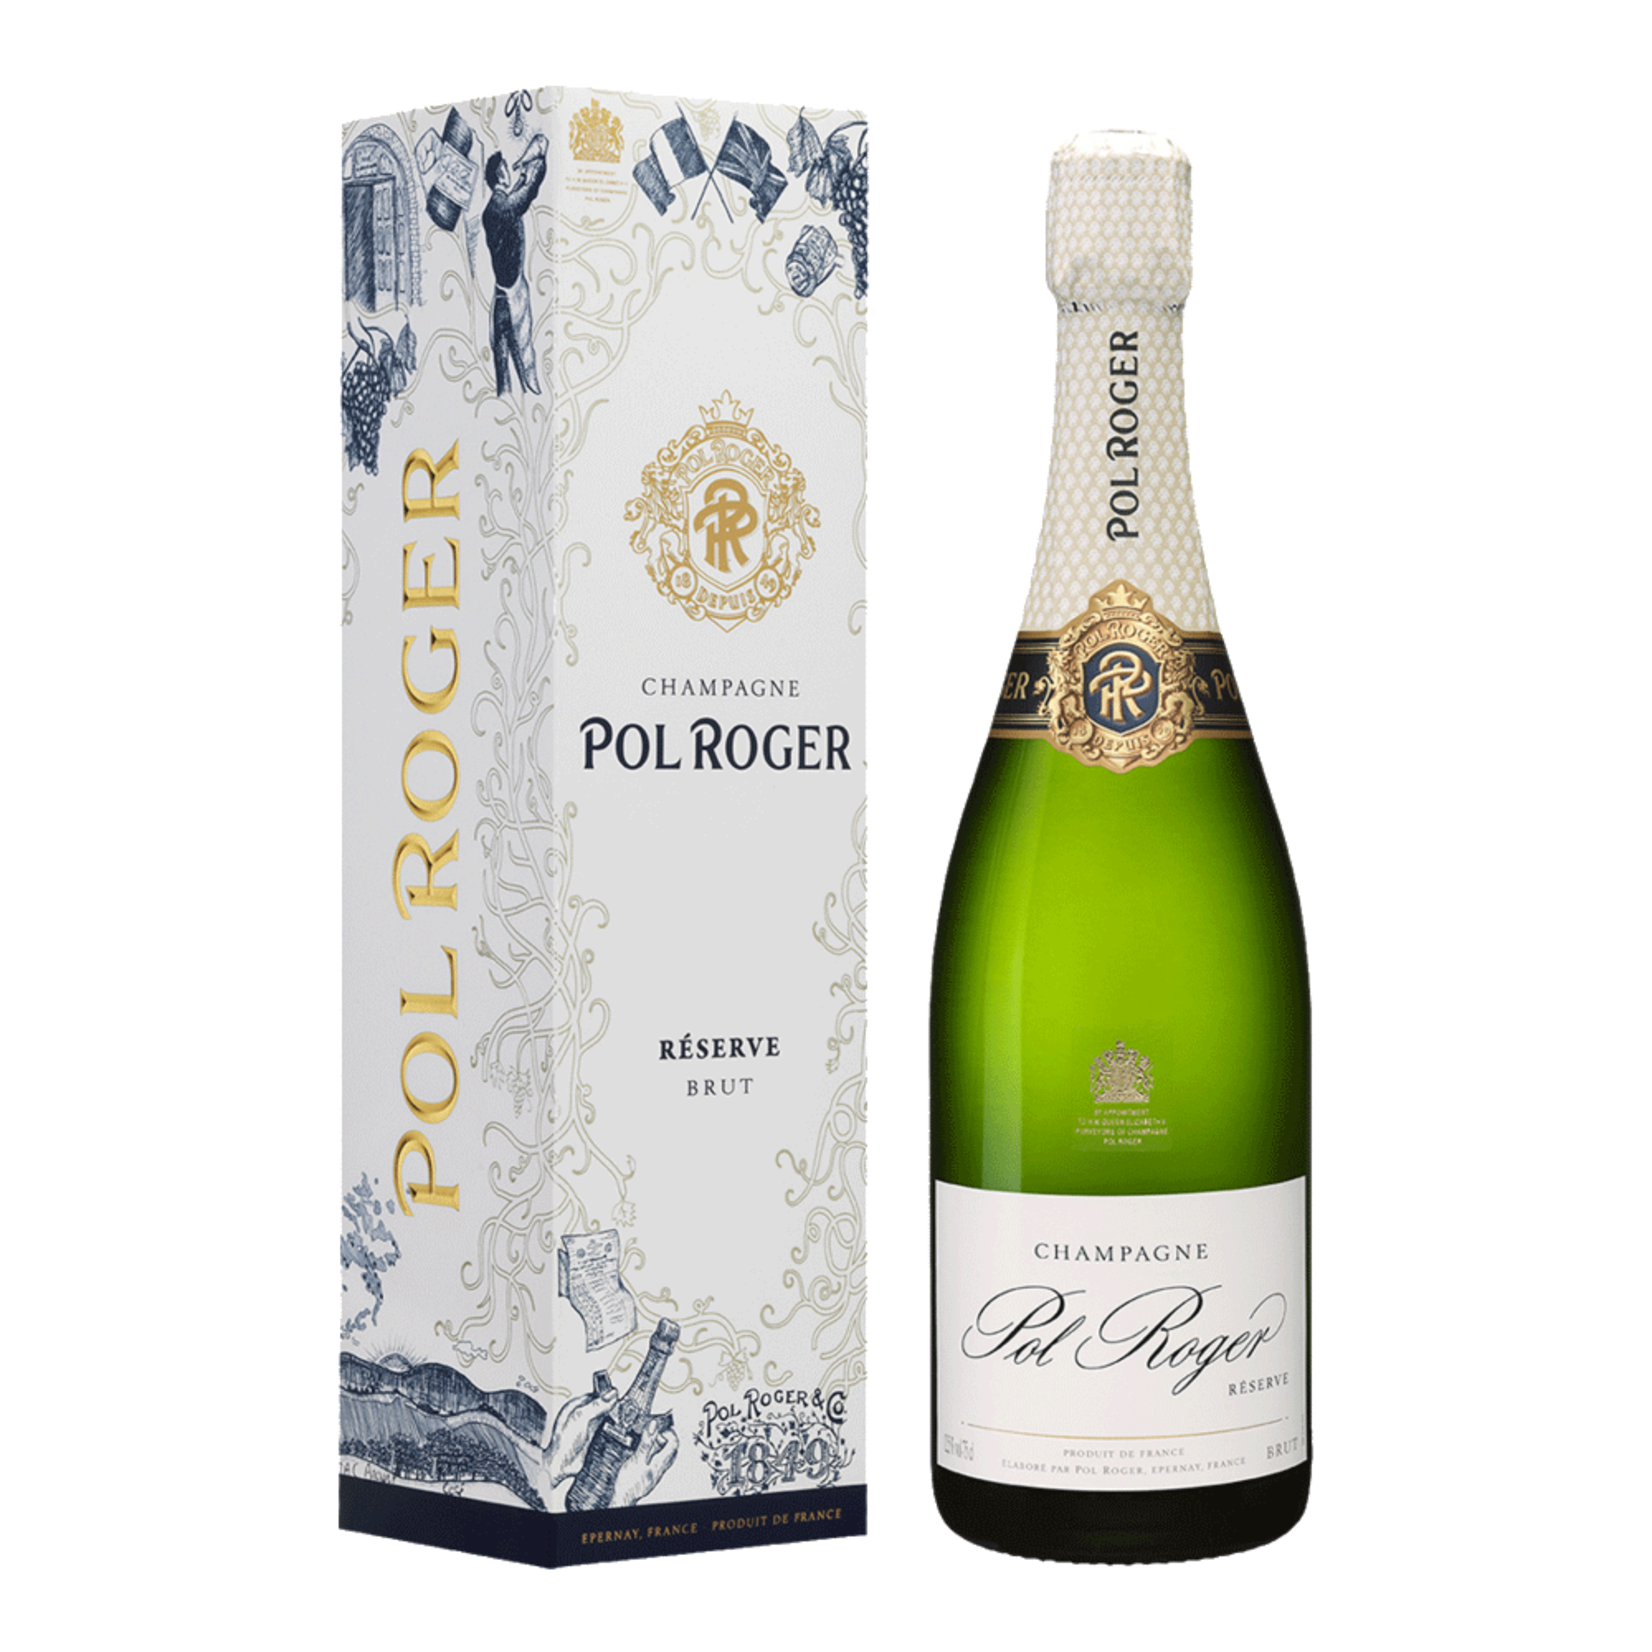 Pol Roger Champagne NV Brut Gift Box